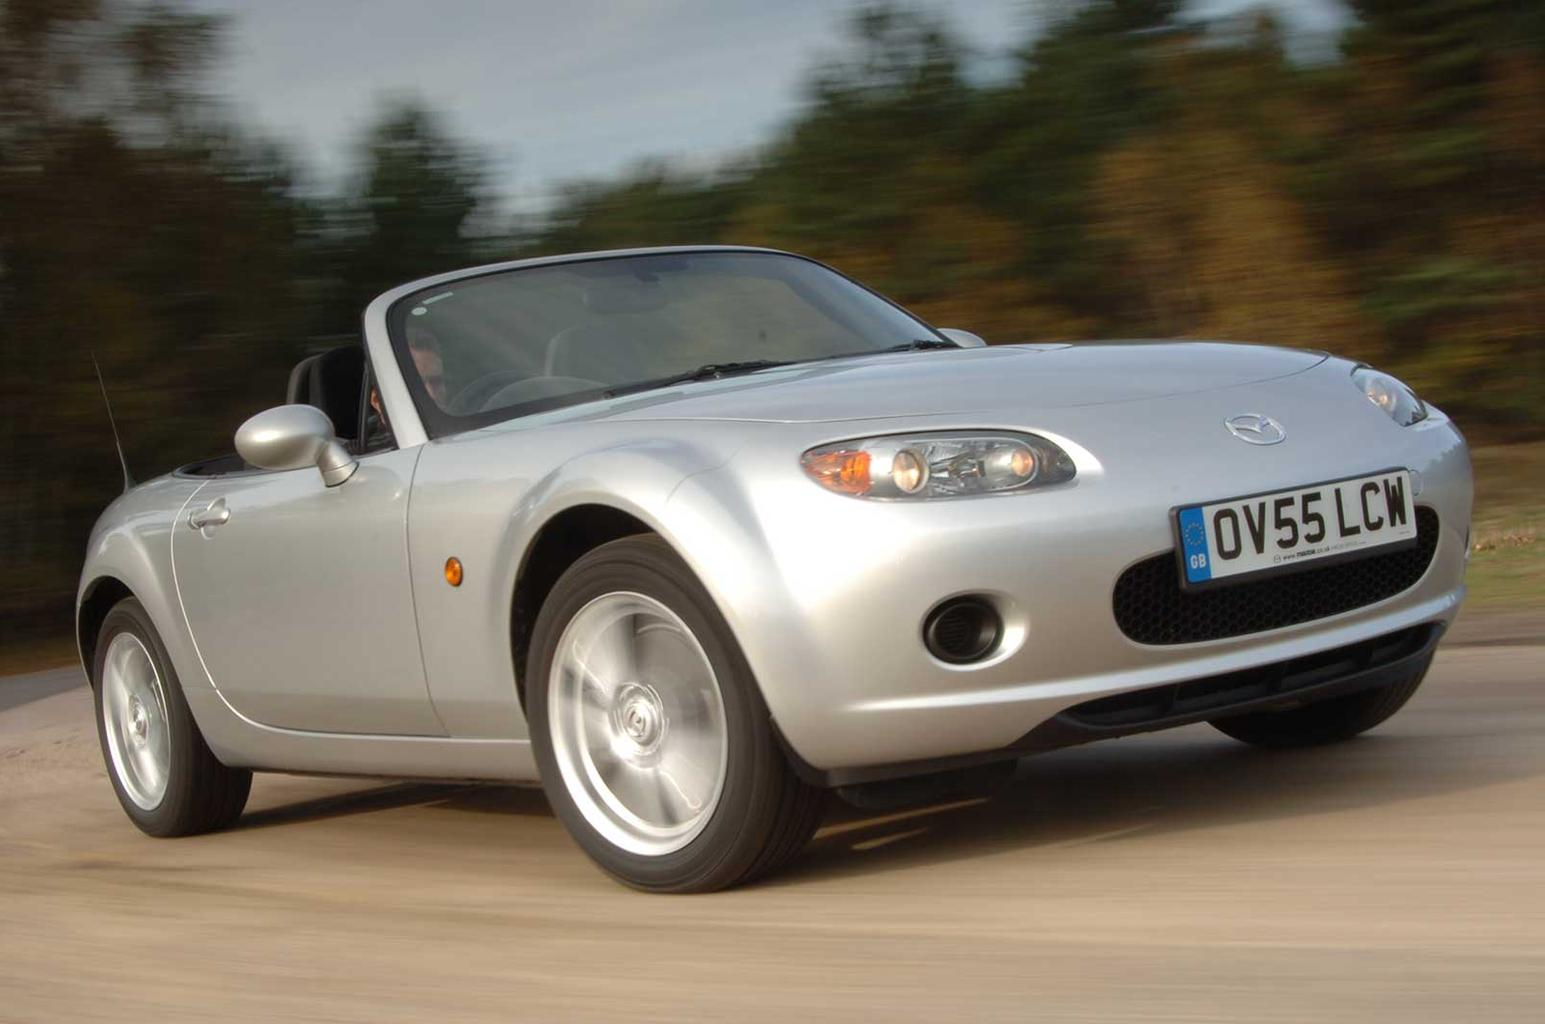 10 reasons to buy a Mazda MX-5